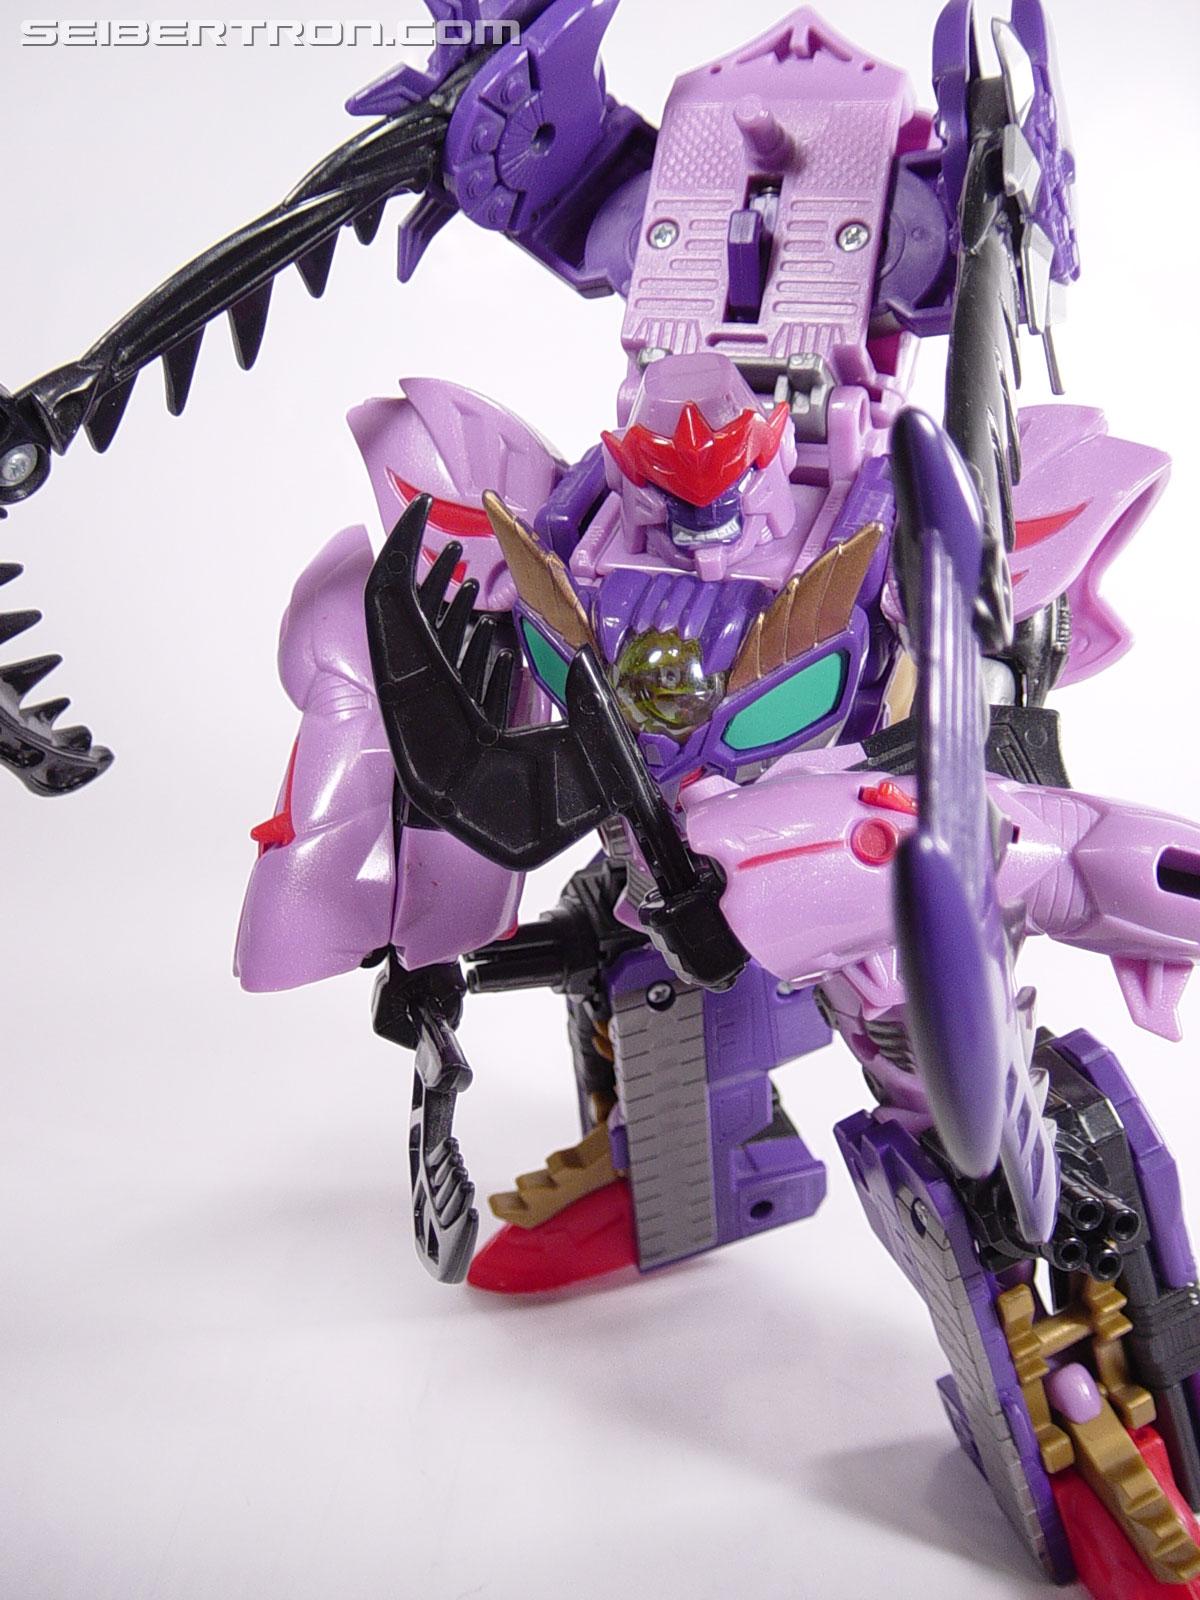 Transformers Beast Wars II Galvatron (Image #62 of 73)